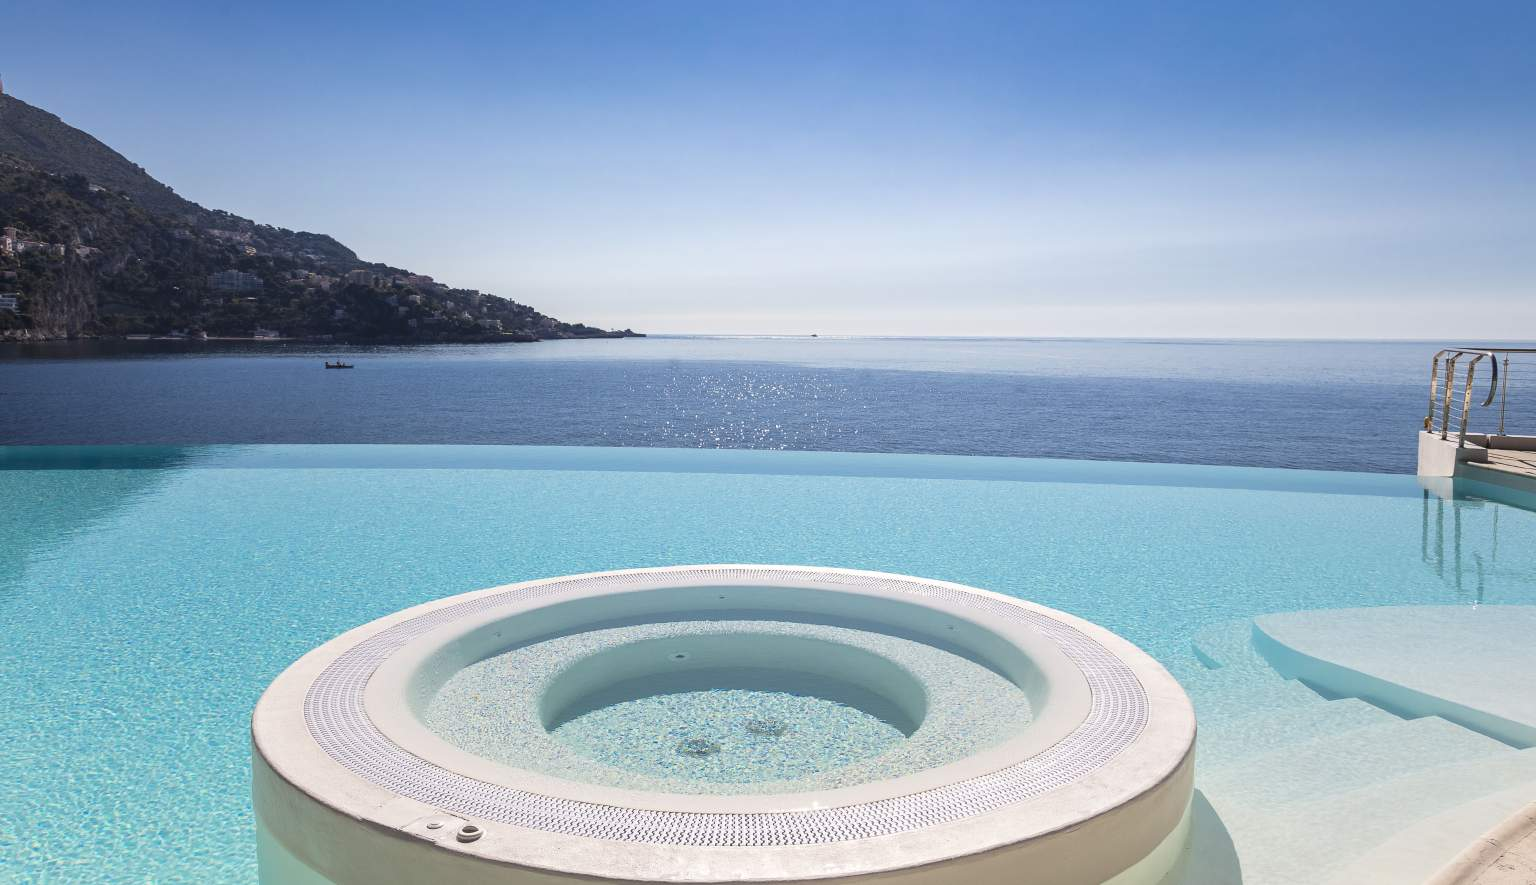 cap-estel-pool-view